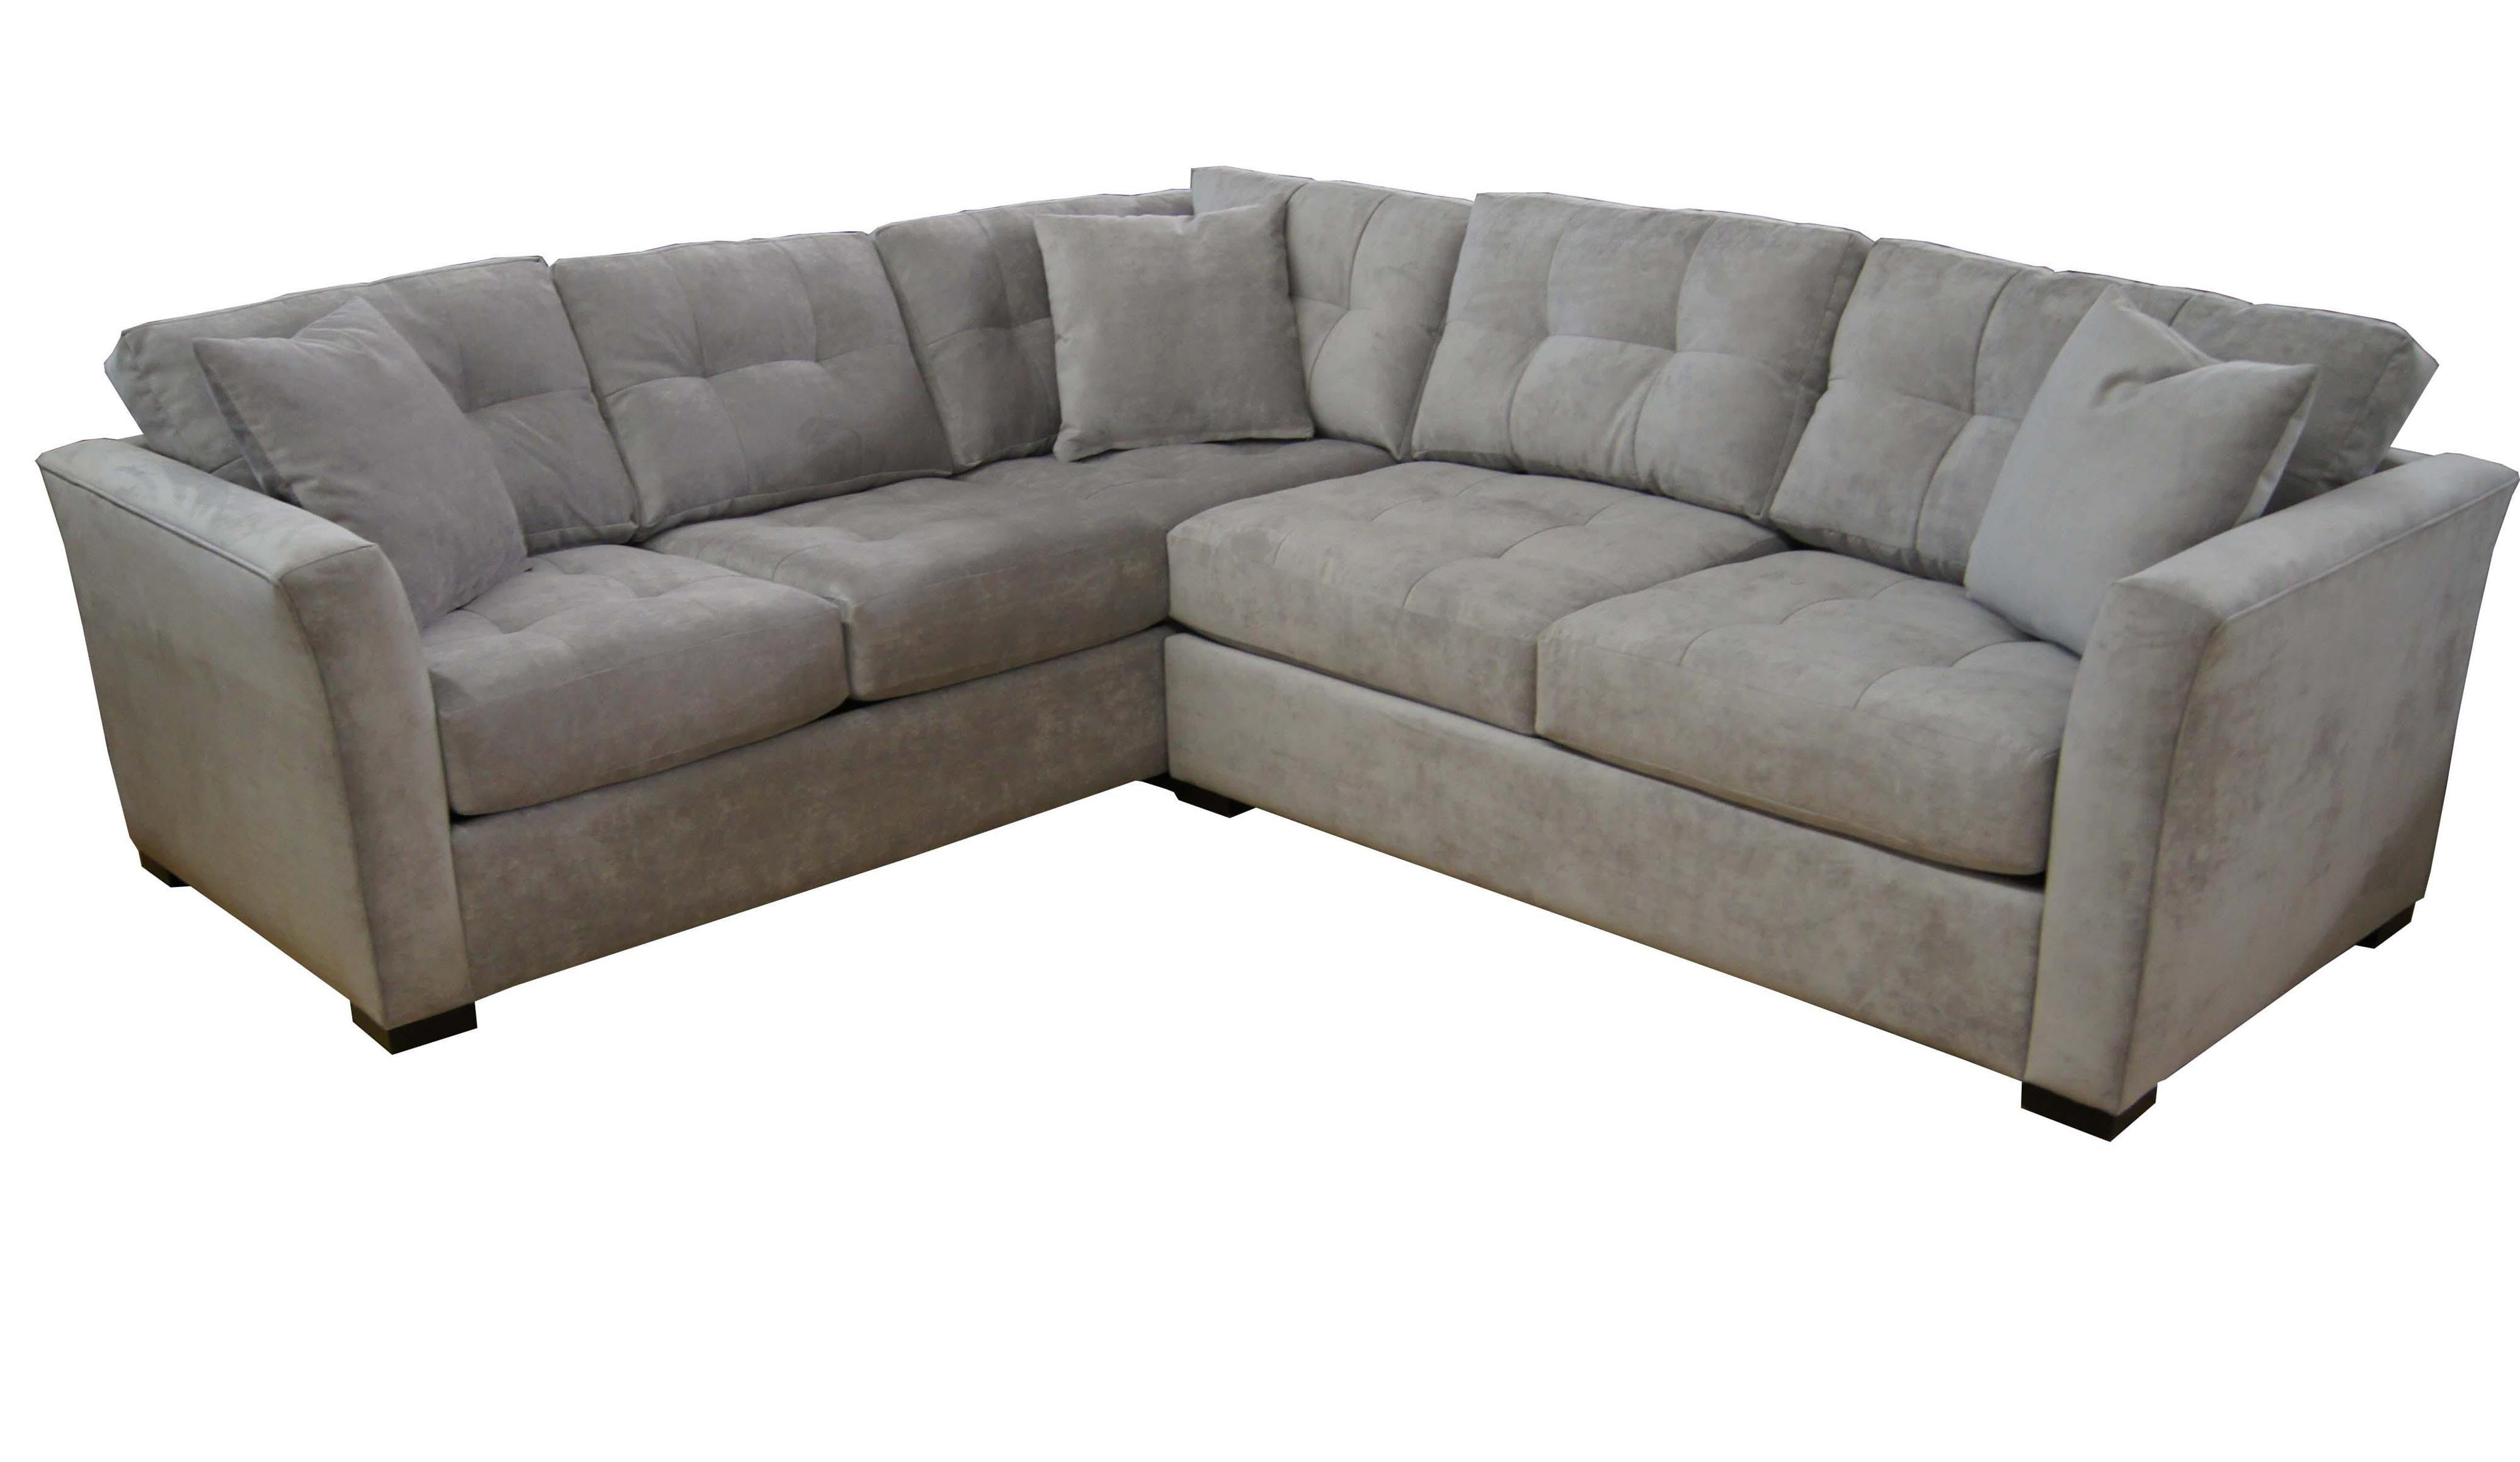 Lennon Lennon Sectional By Jonathan Louis Sectional Sofa Sectional Sectional Couch